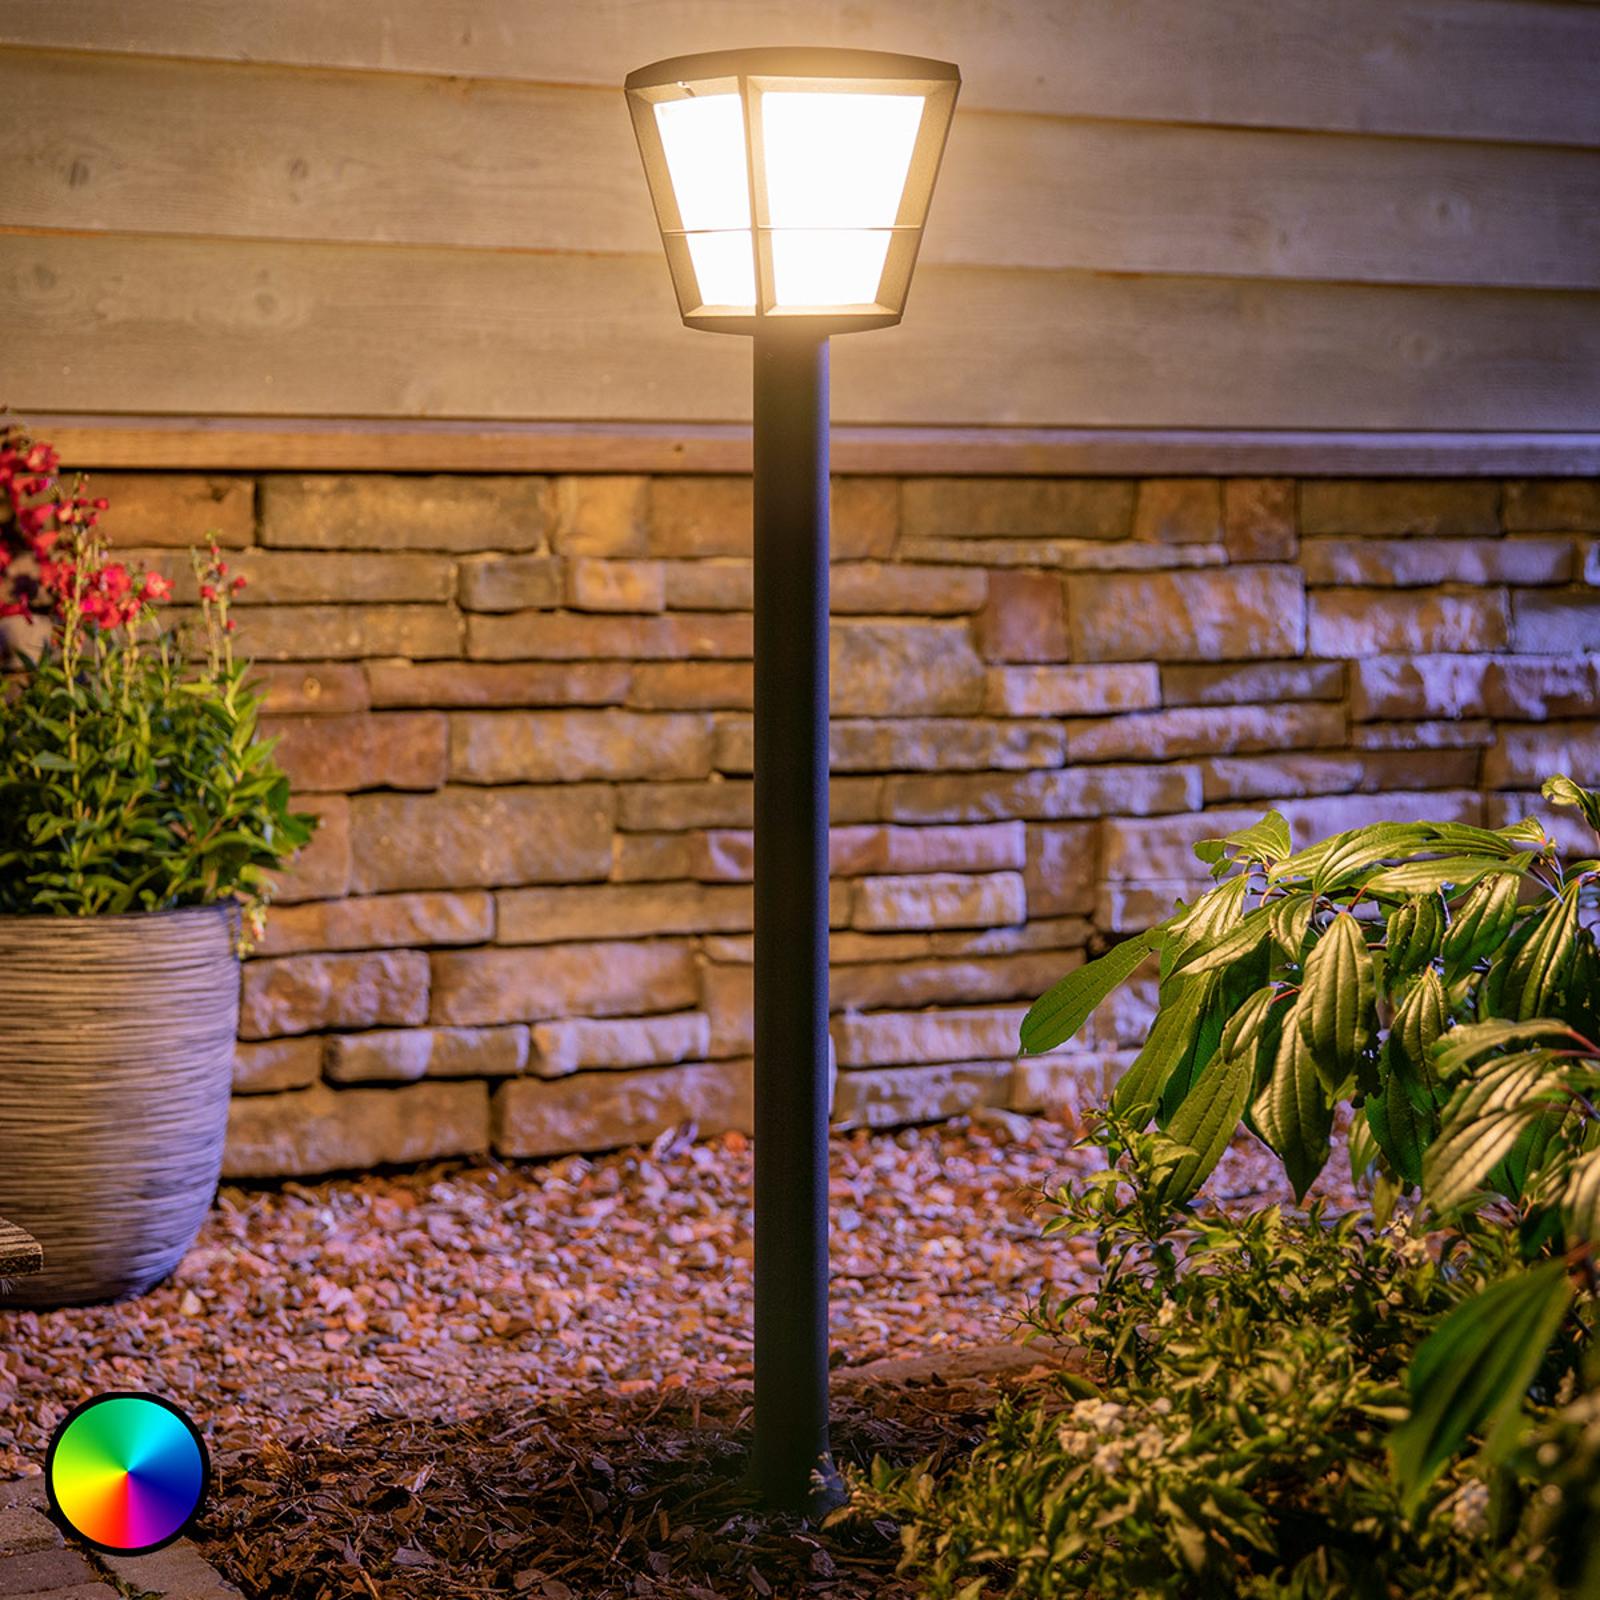 Philips Hue White+Color Econic LED-Wegeleuchte